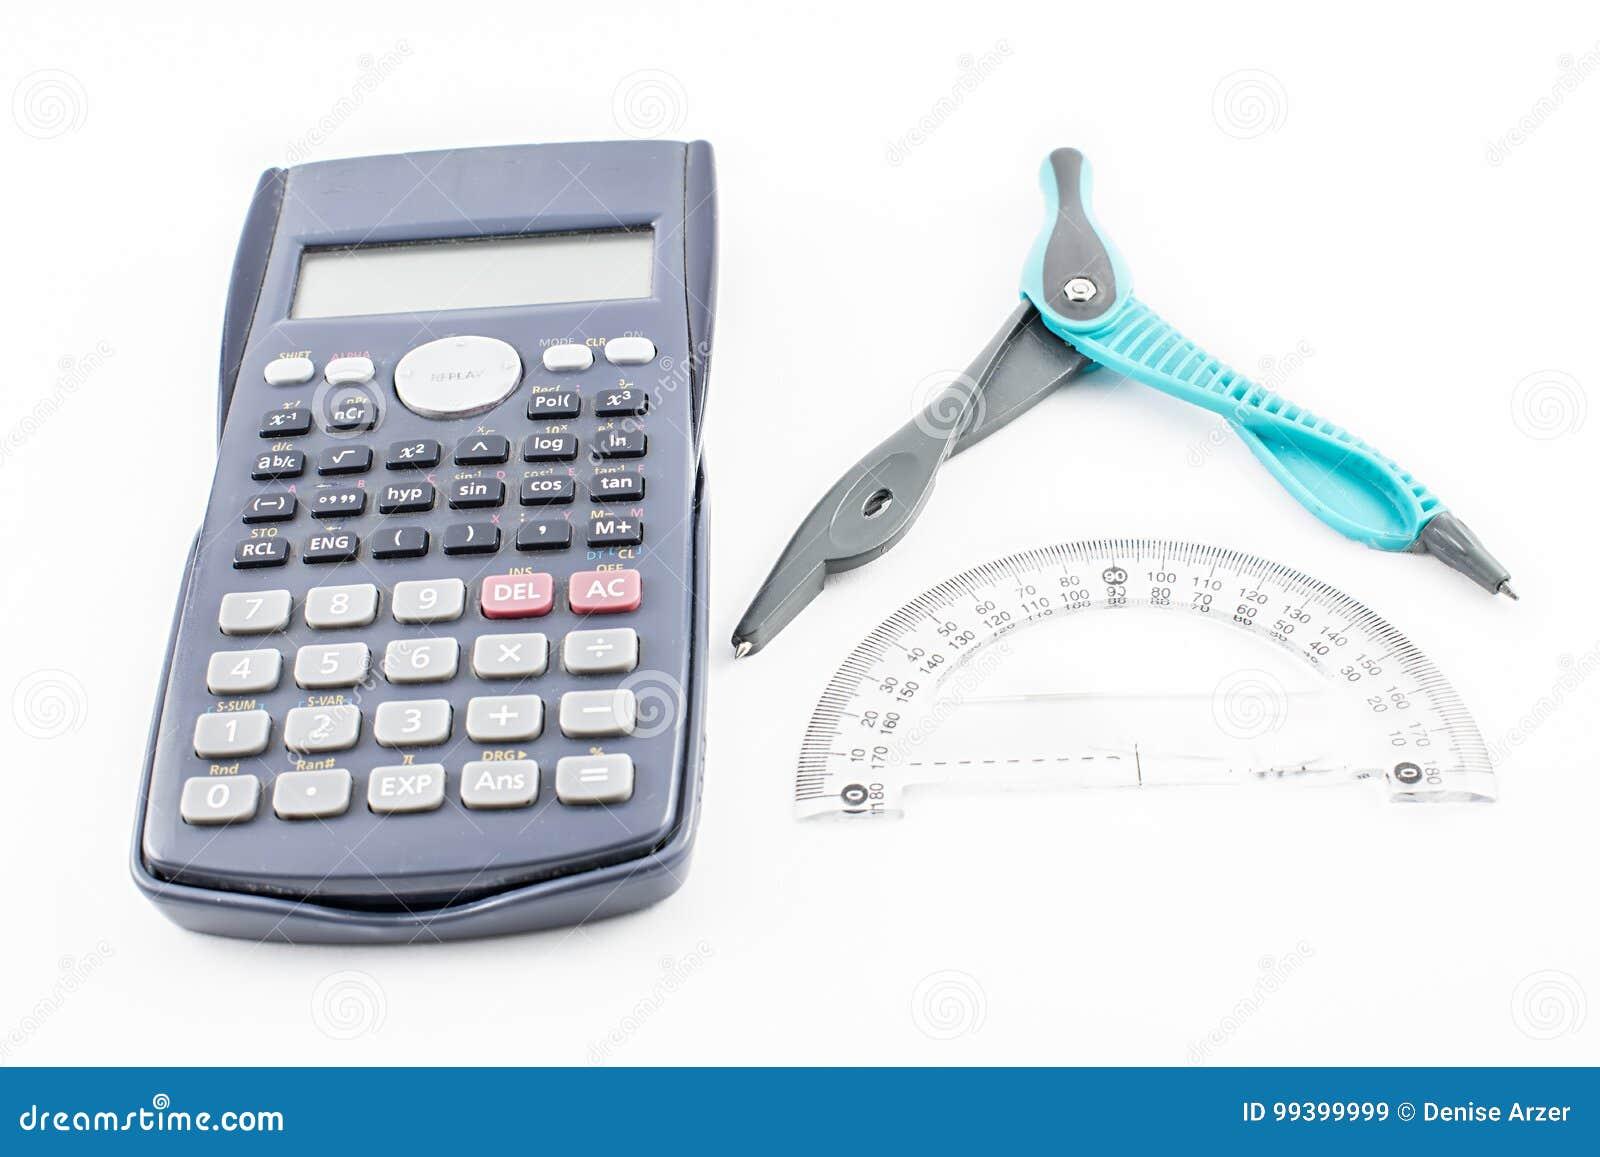 Калькулятор то транспортер самойловка элеватор